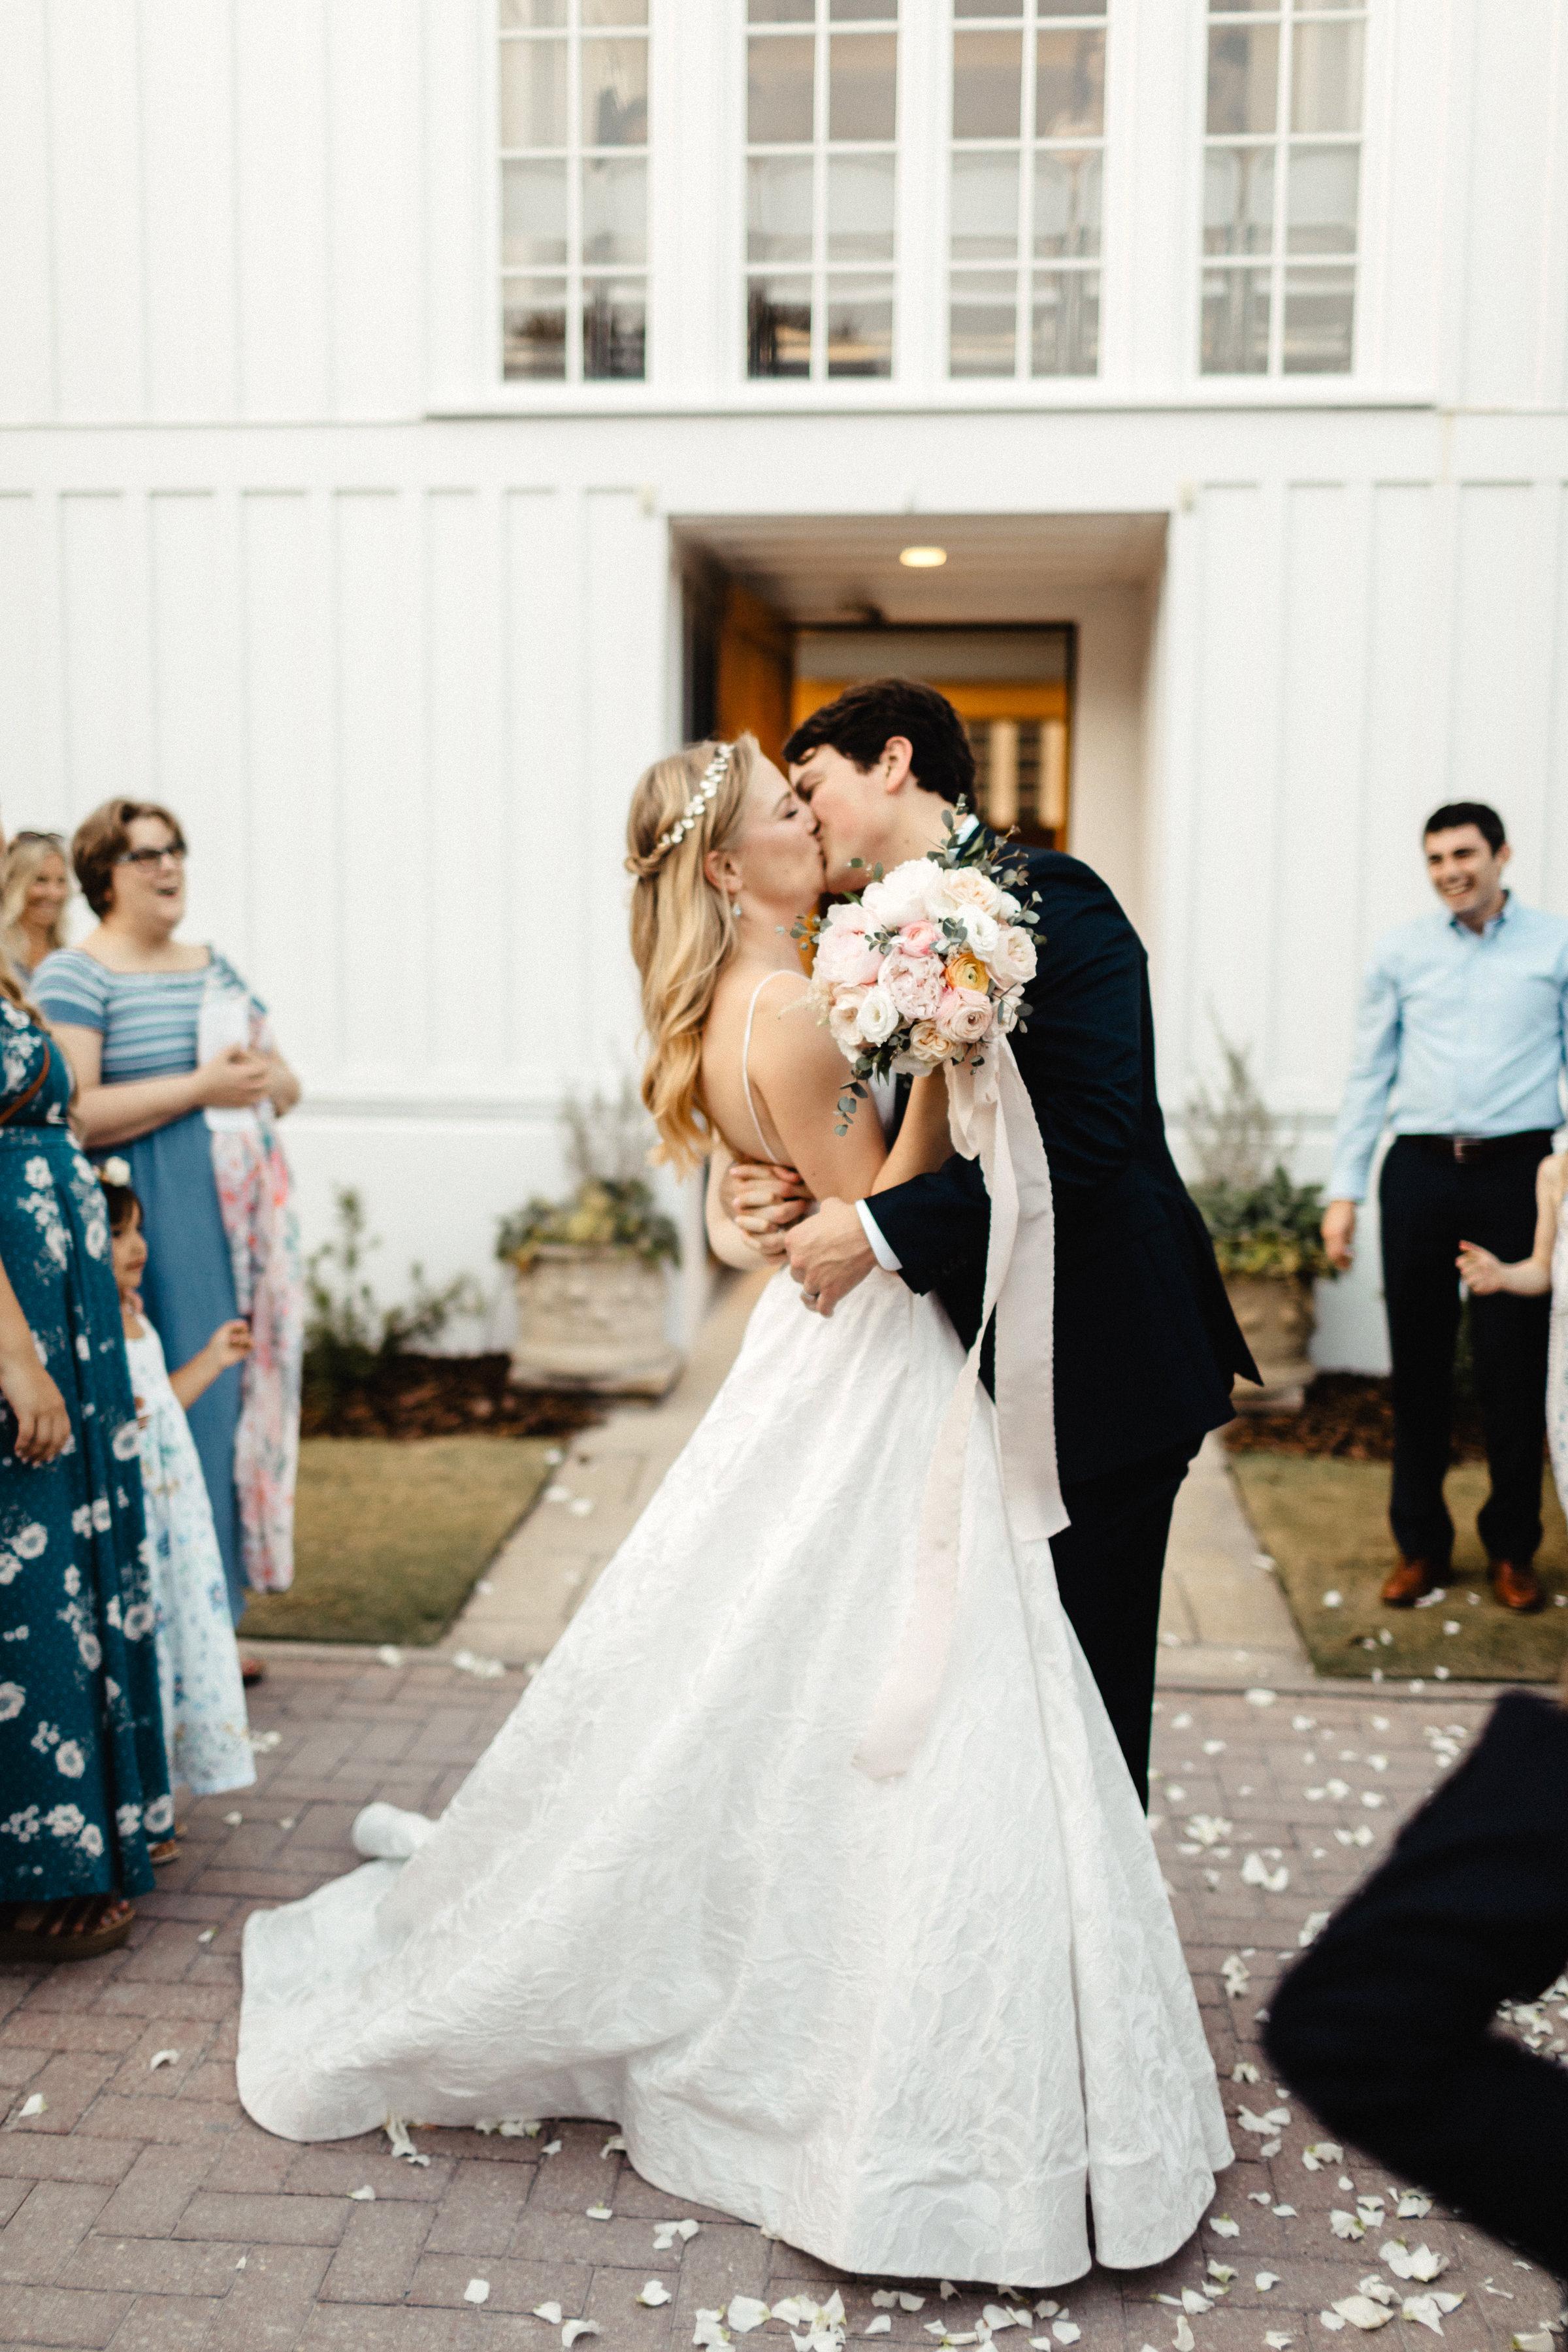 Wedding petal toss outside the Seaside Chapel